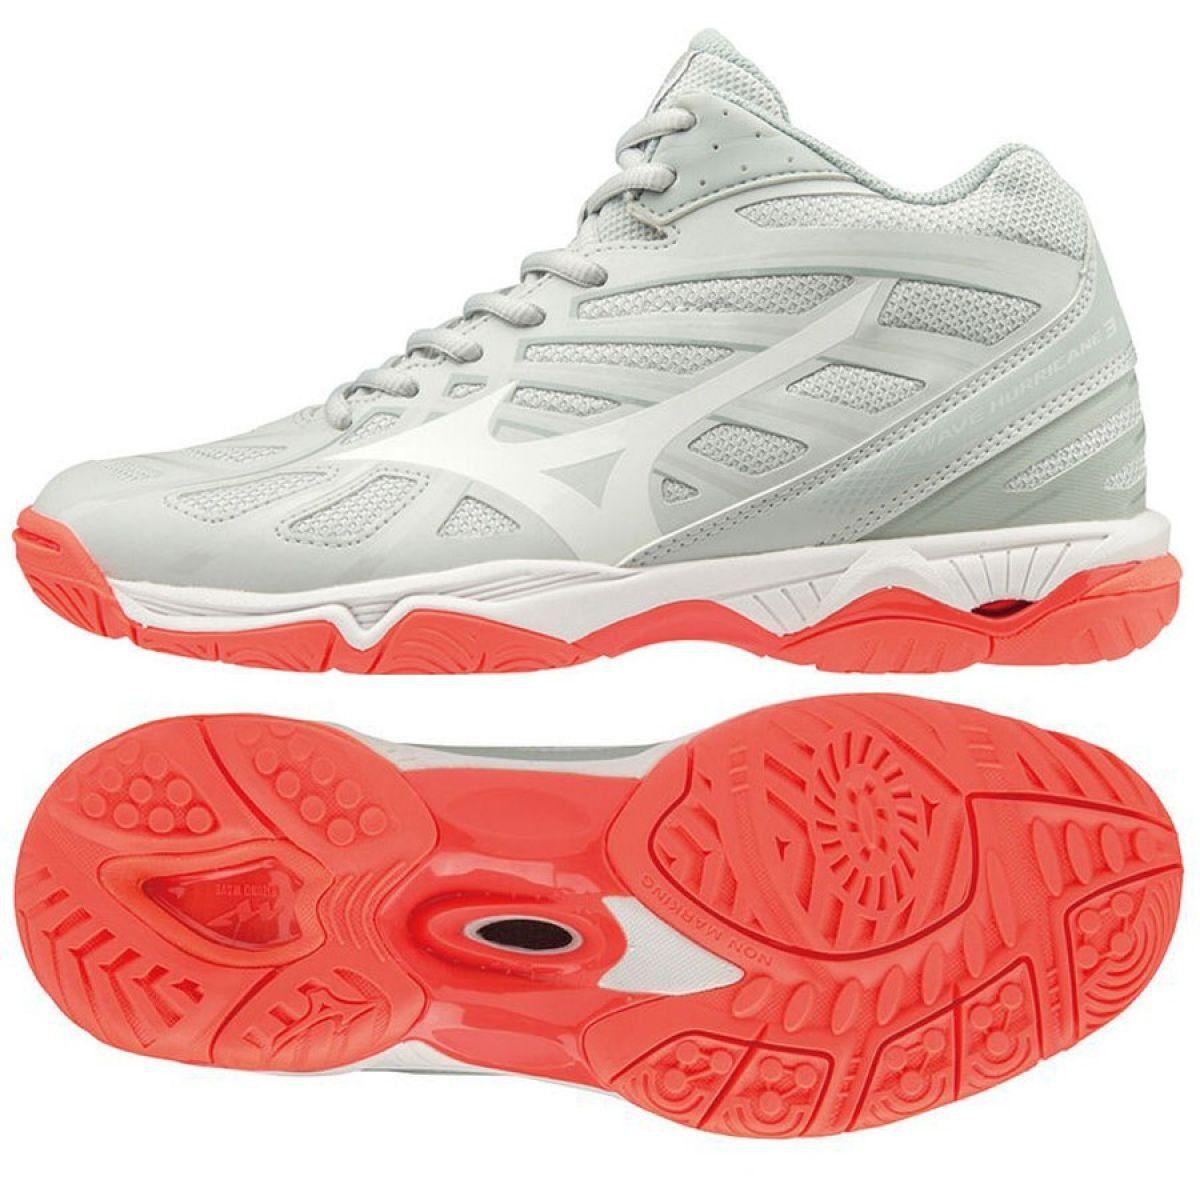 Buty Mizuno Wave Hurricane 3 Mid W V1gc174560 Biale Biale Mizuno Shoes Shoe Laces Shoes